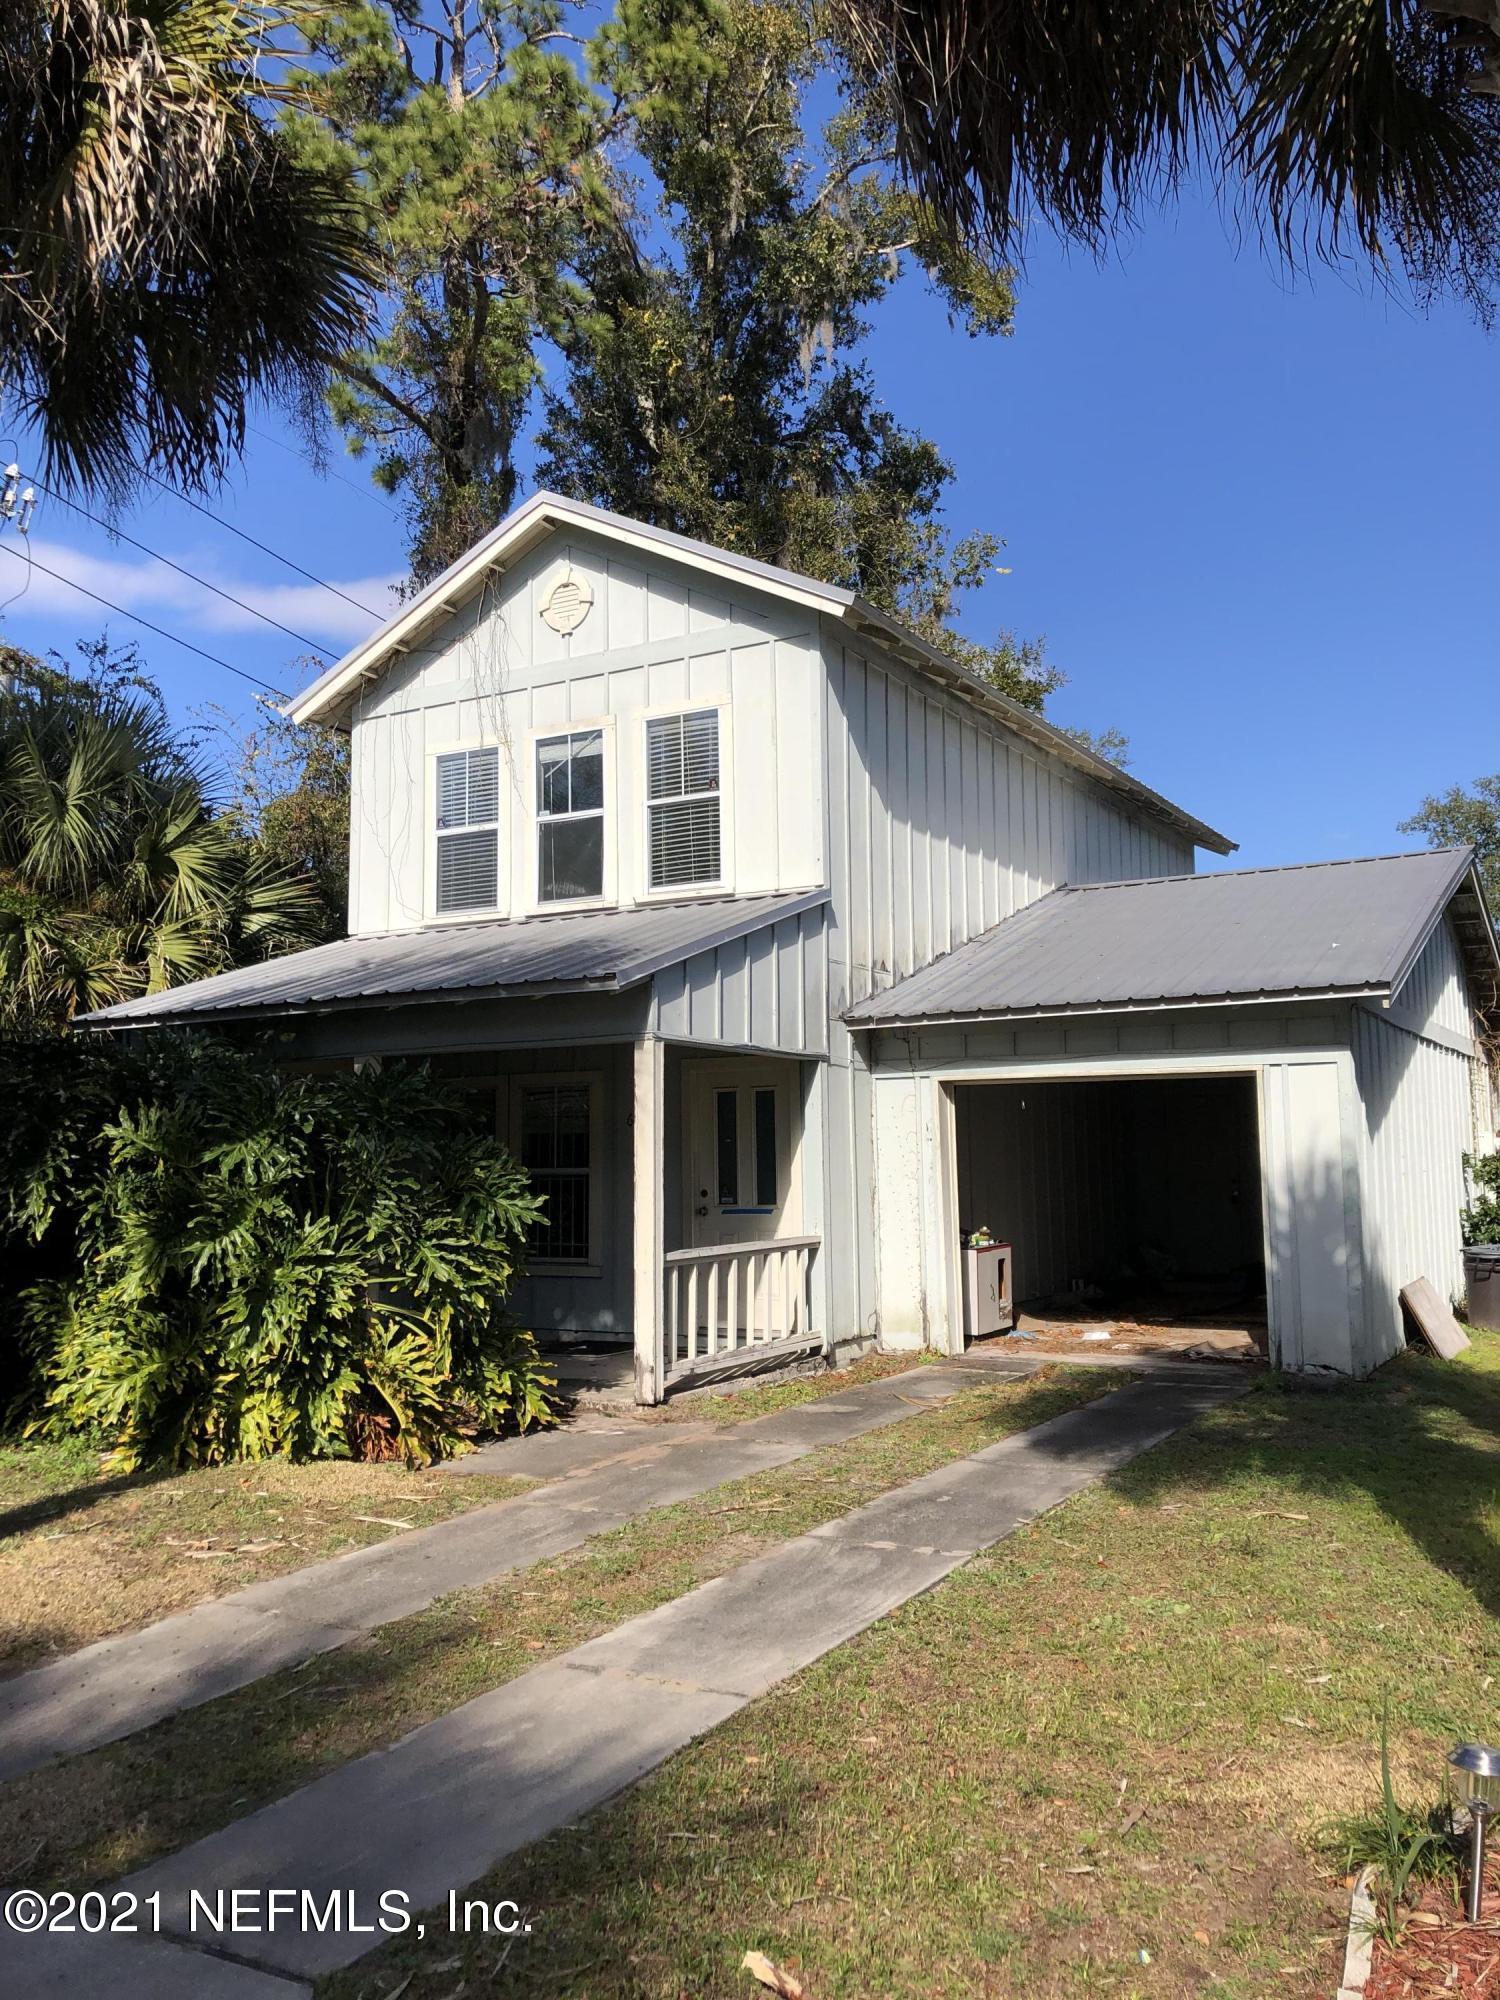 680 CORDUROY, ORANGE PARK, FLORIDA 32073, 2 Bedrooms Bedrooms, ,1 BathroomBathrooms,Residential,For sale,CORDUROY,1093151